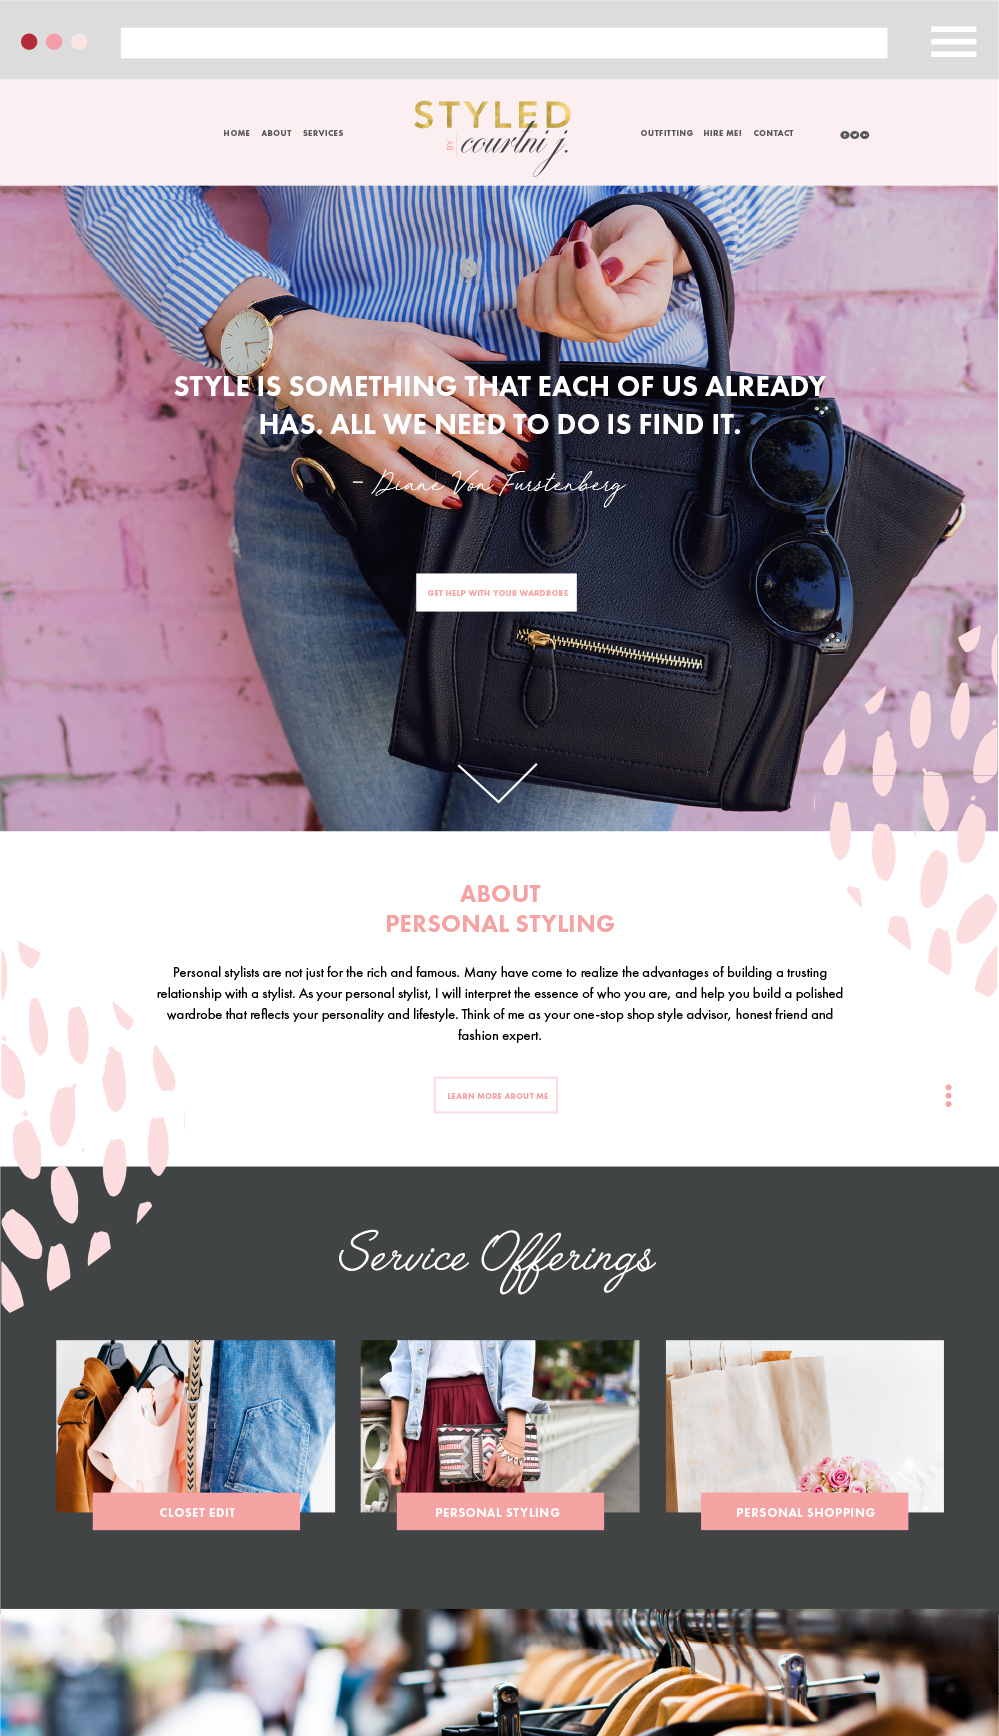 SBK_Web_Mockup.jpg